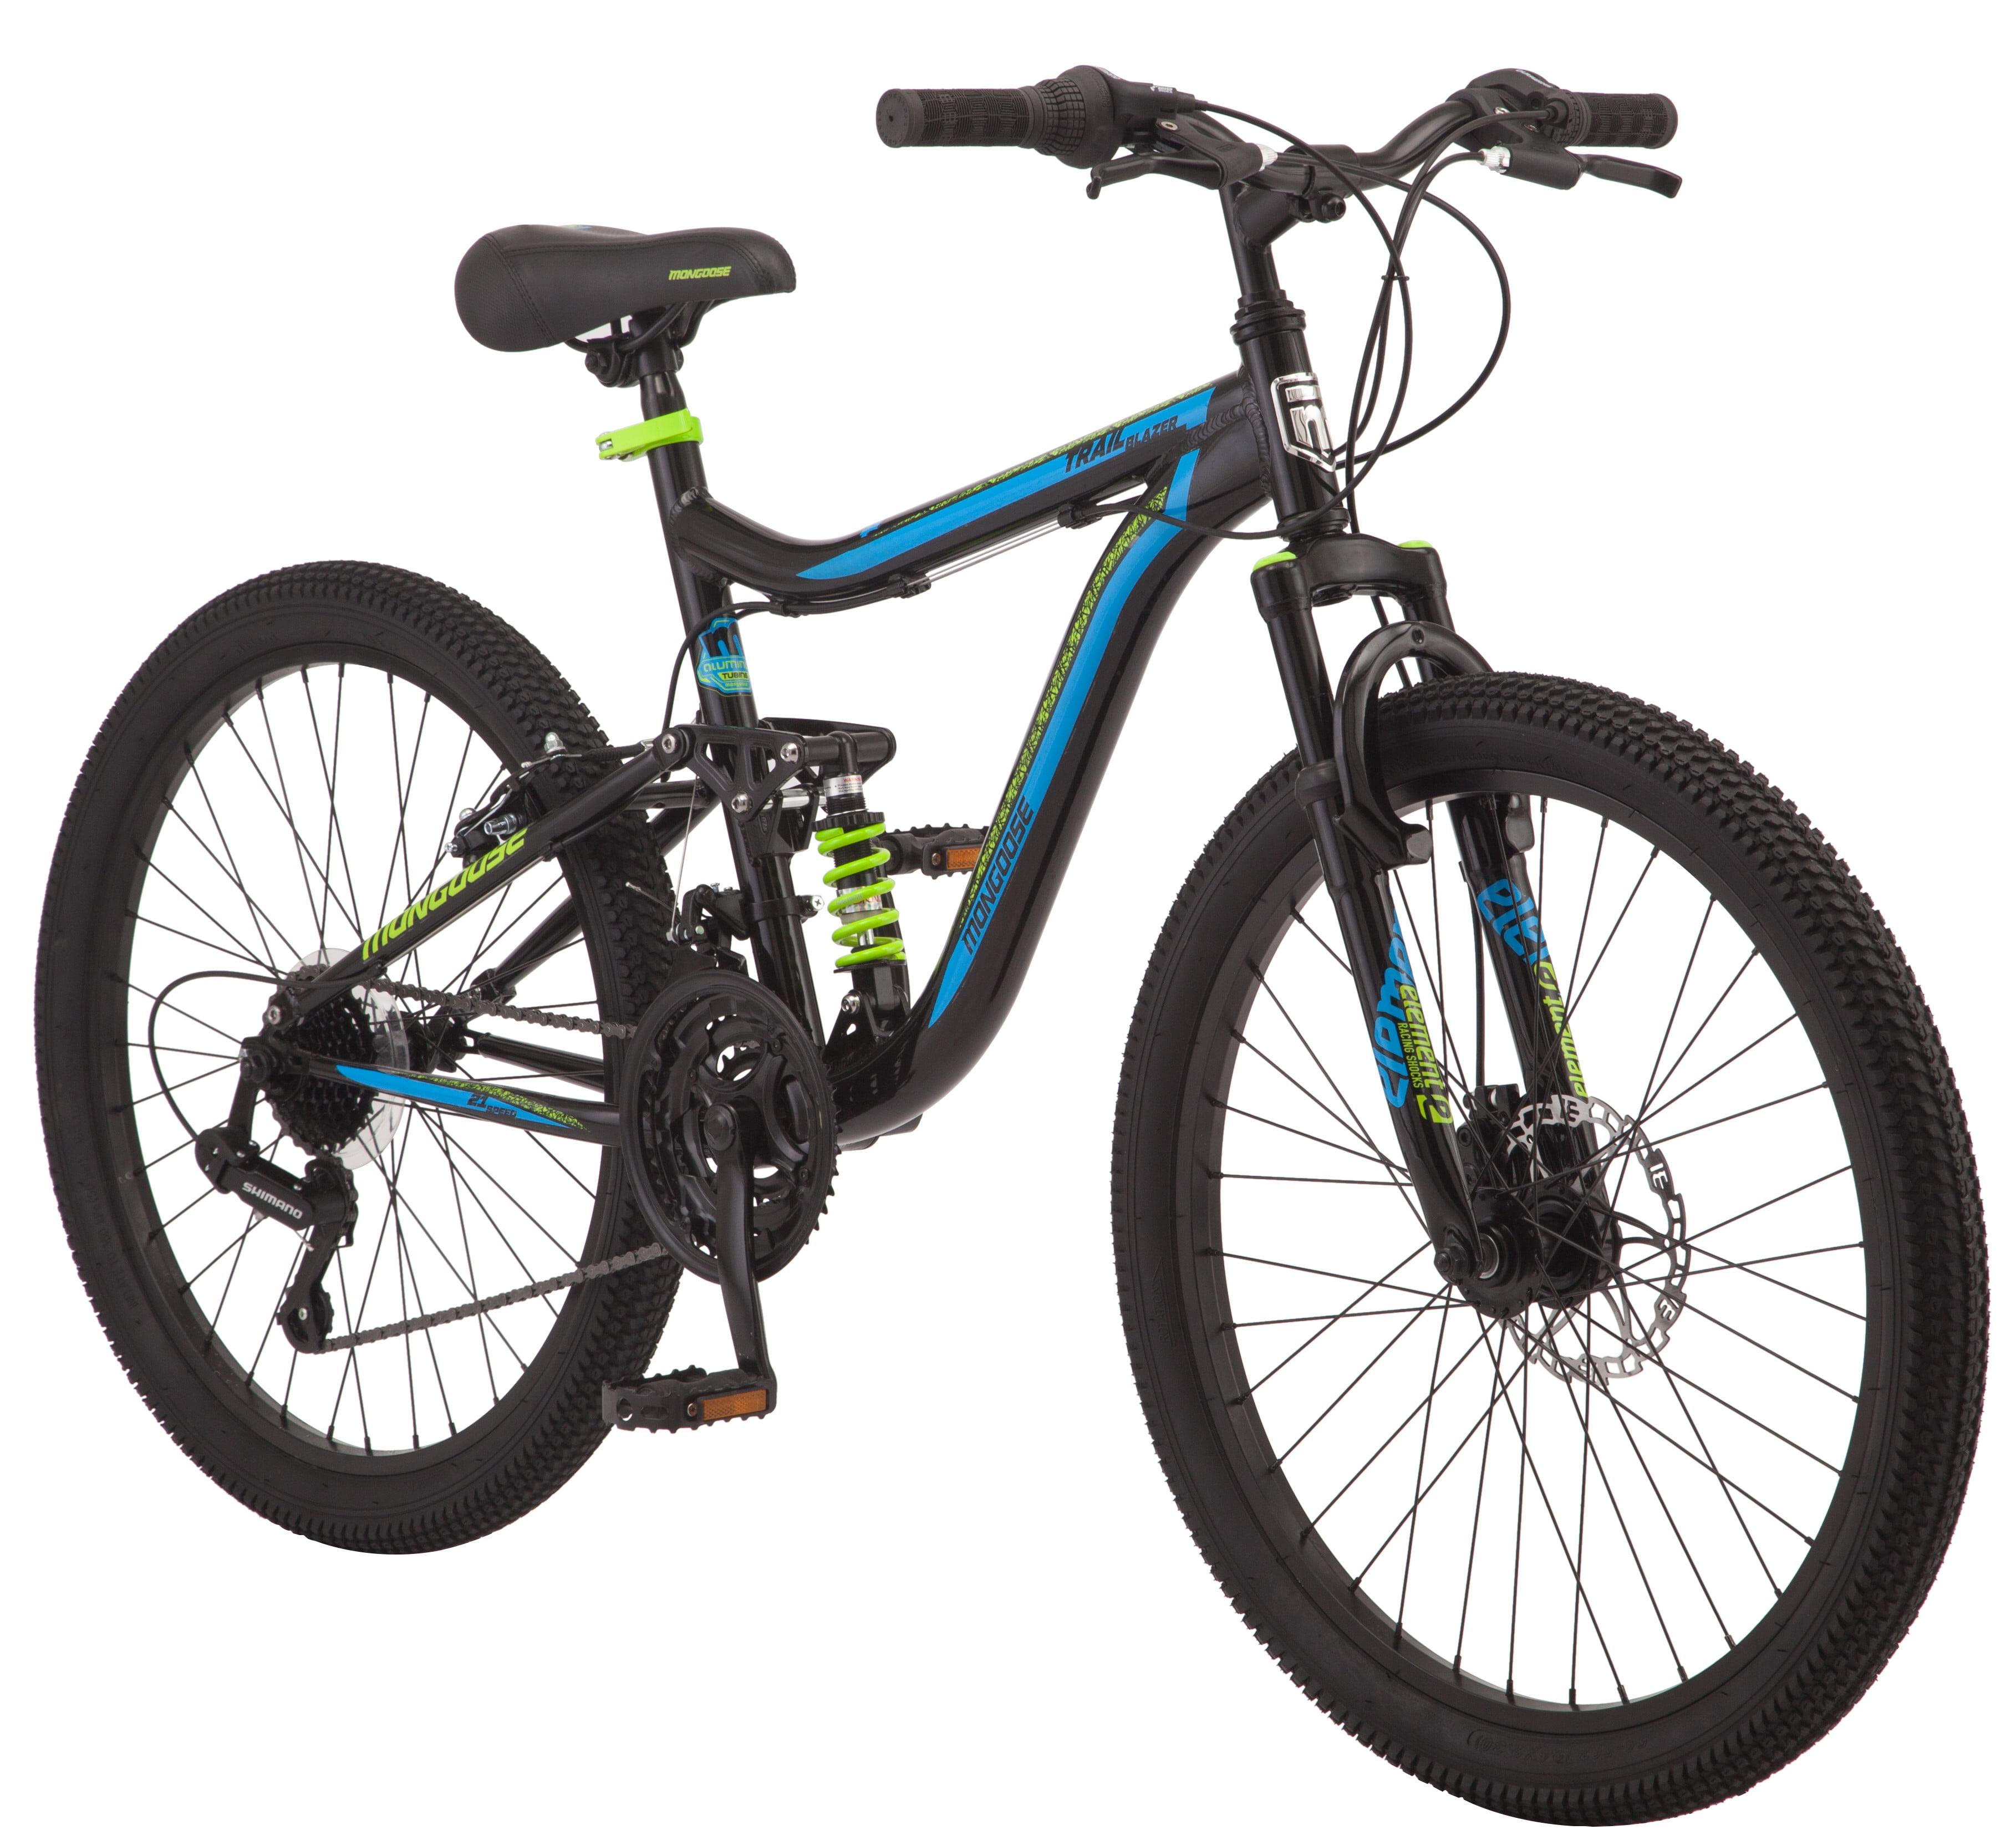 "Mongoose Trail Blazer Mountain Bike, 24"" wheels, 21 speeds, black by Pacific Cycle"